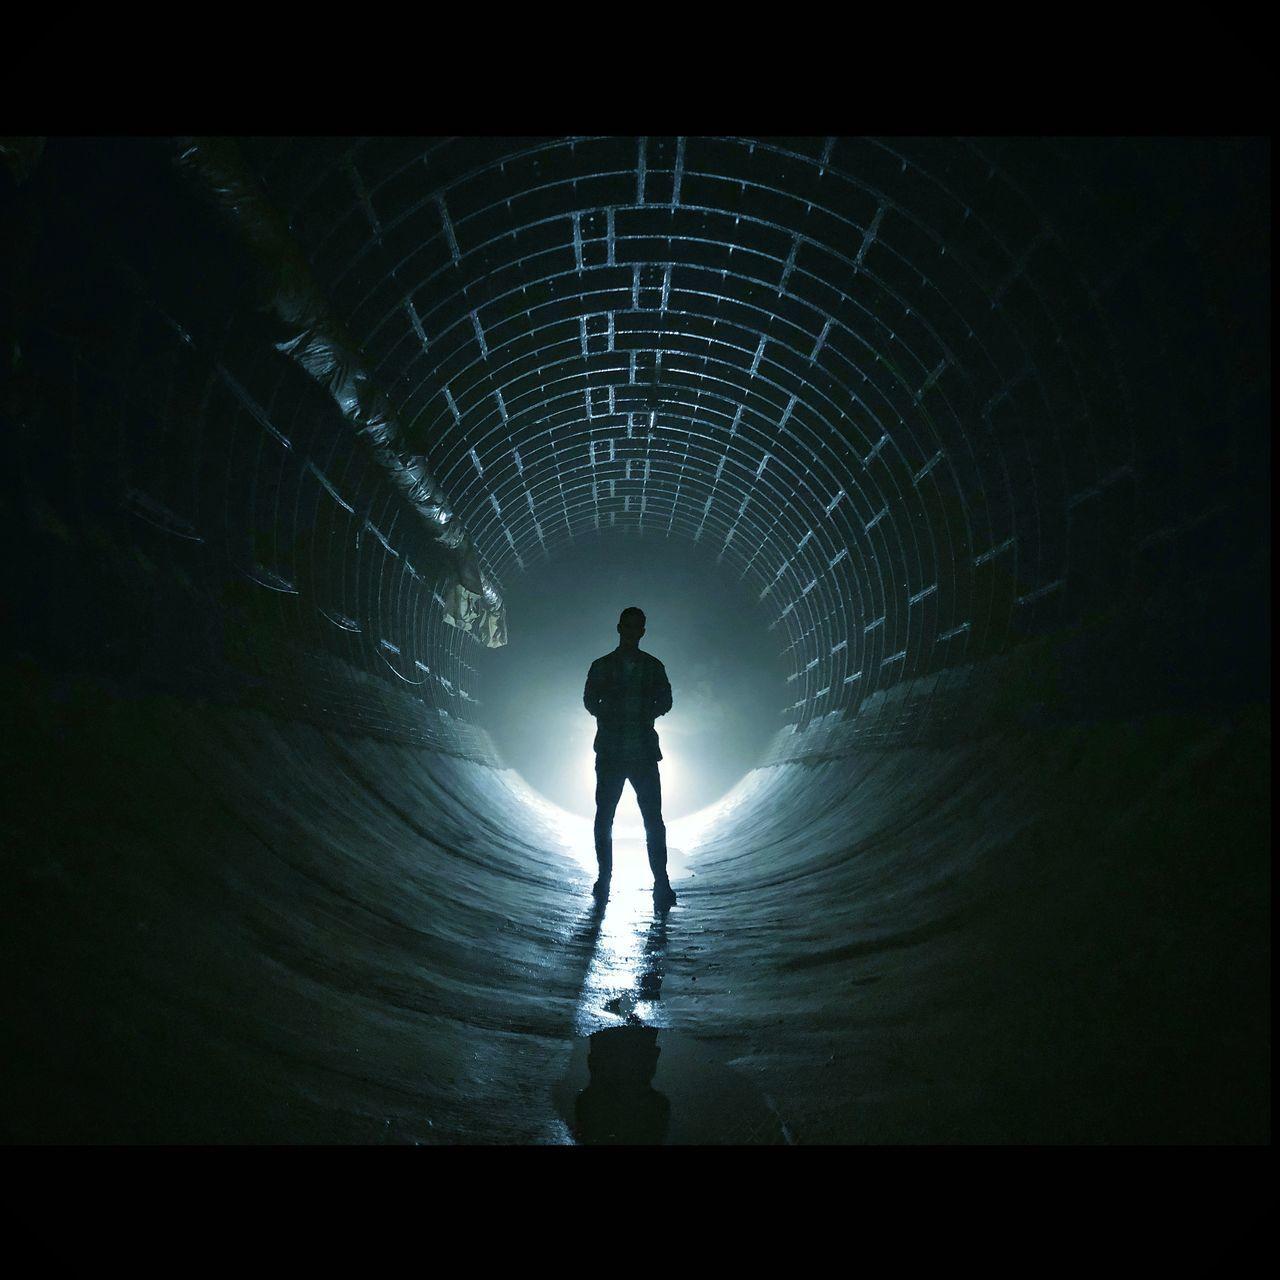 FULL LENGTH REAR VIEW OF SILHOUETTE MAN WALKING IN TUNNEL